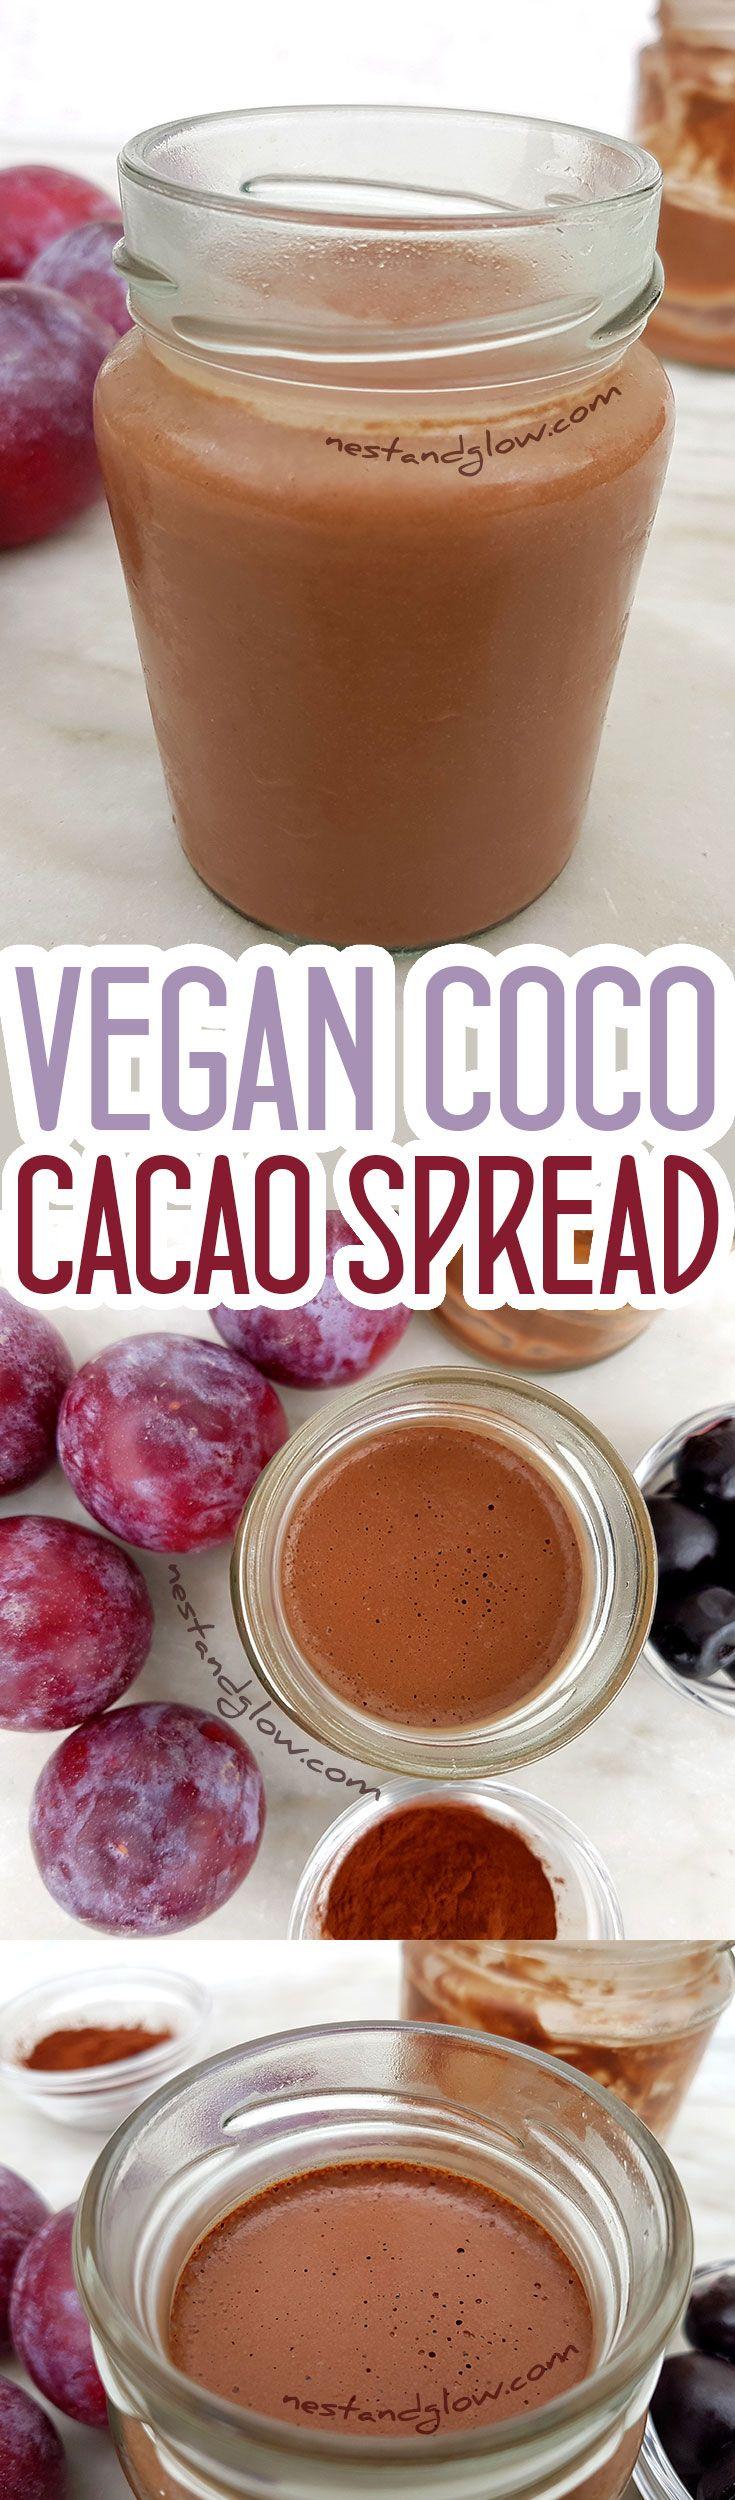 Vegan Coco Cacao Spread - Easy to make dairy free coconut chocolate spread via @nestandglow